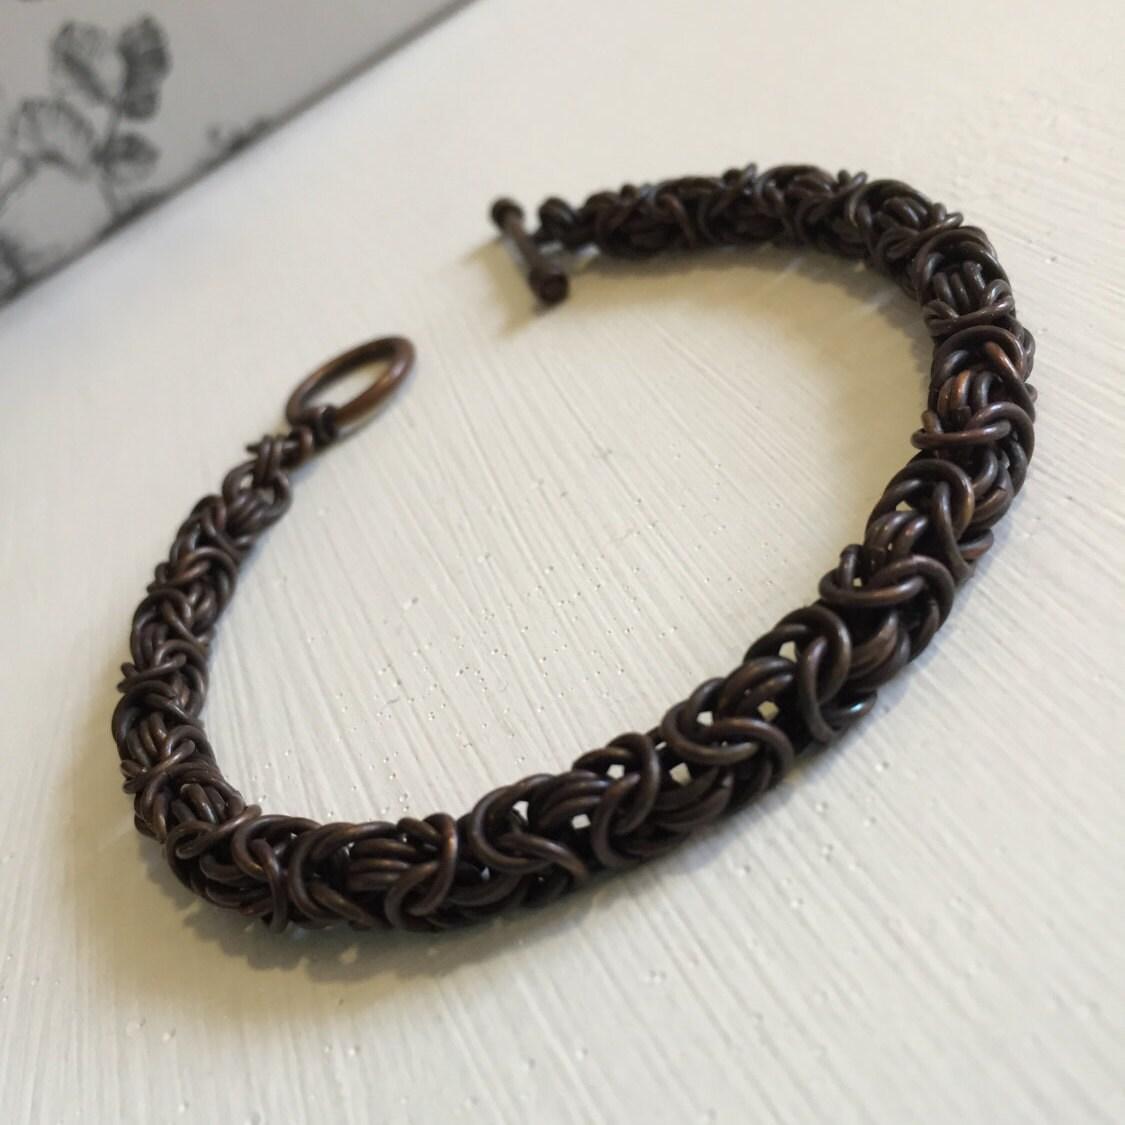 Dunklen Kupfer Armband Herren Kupfer byzantinischen Armband